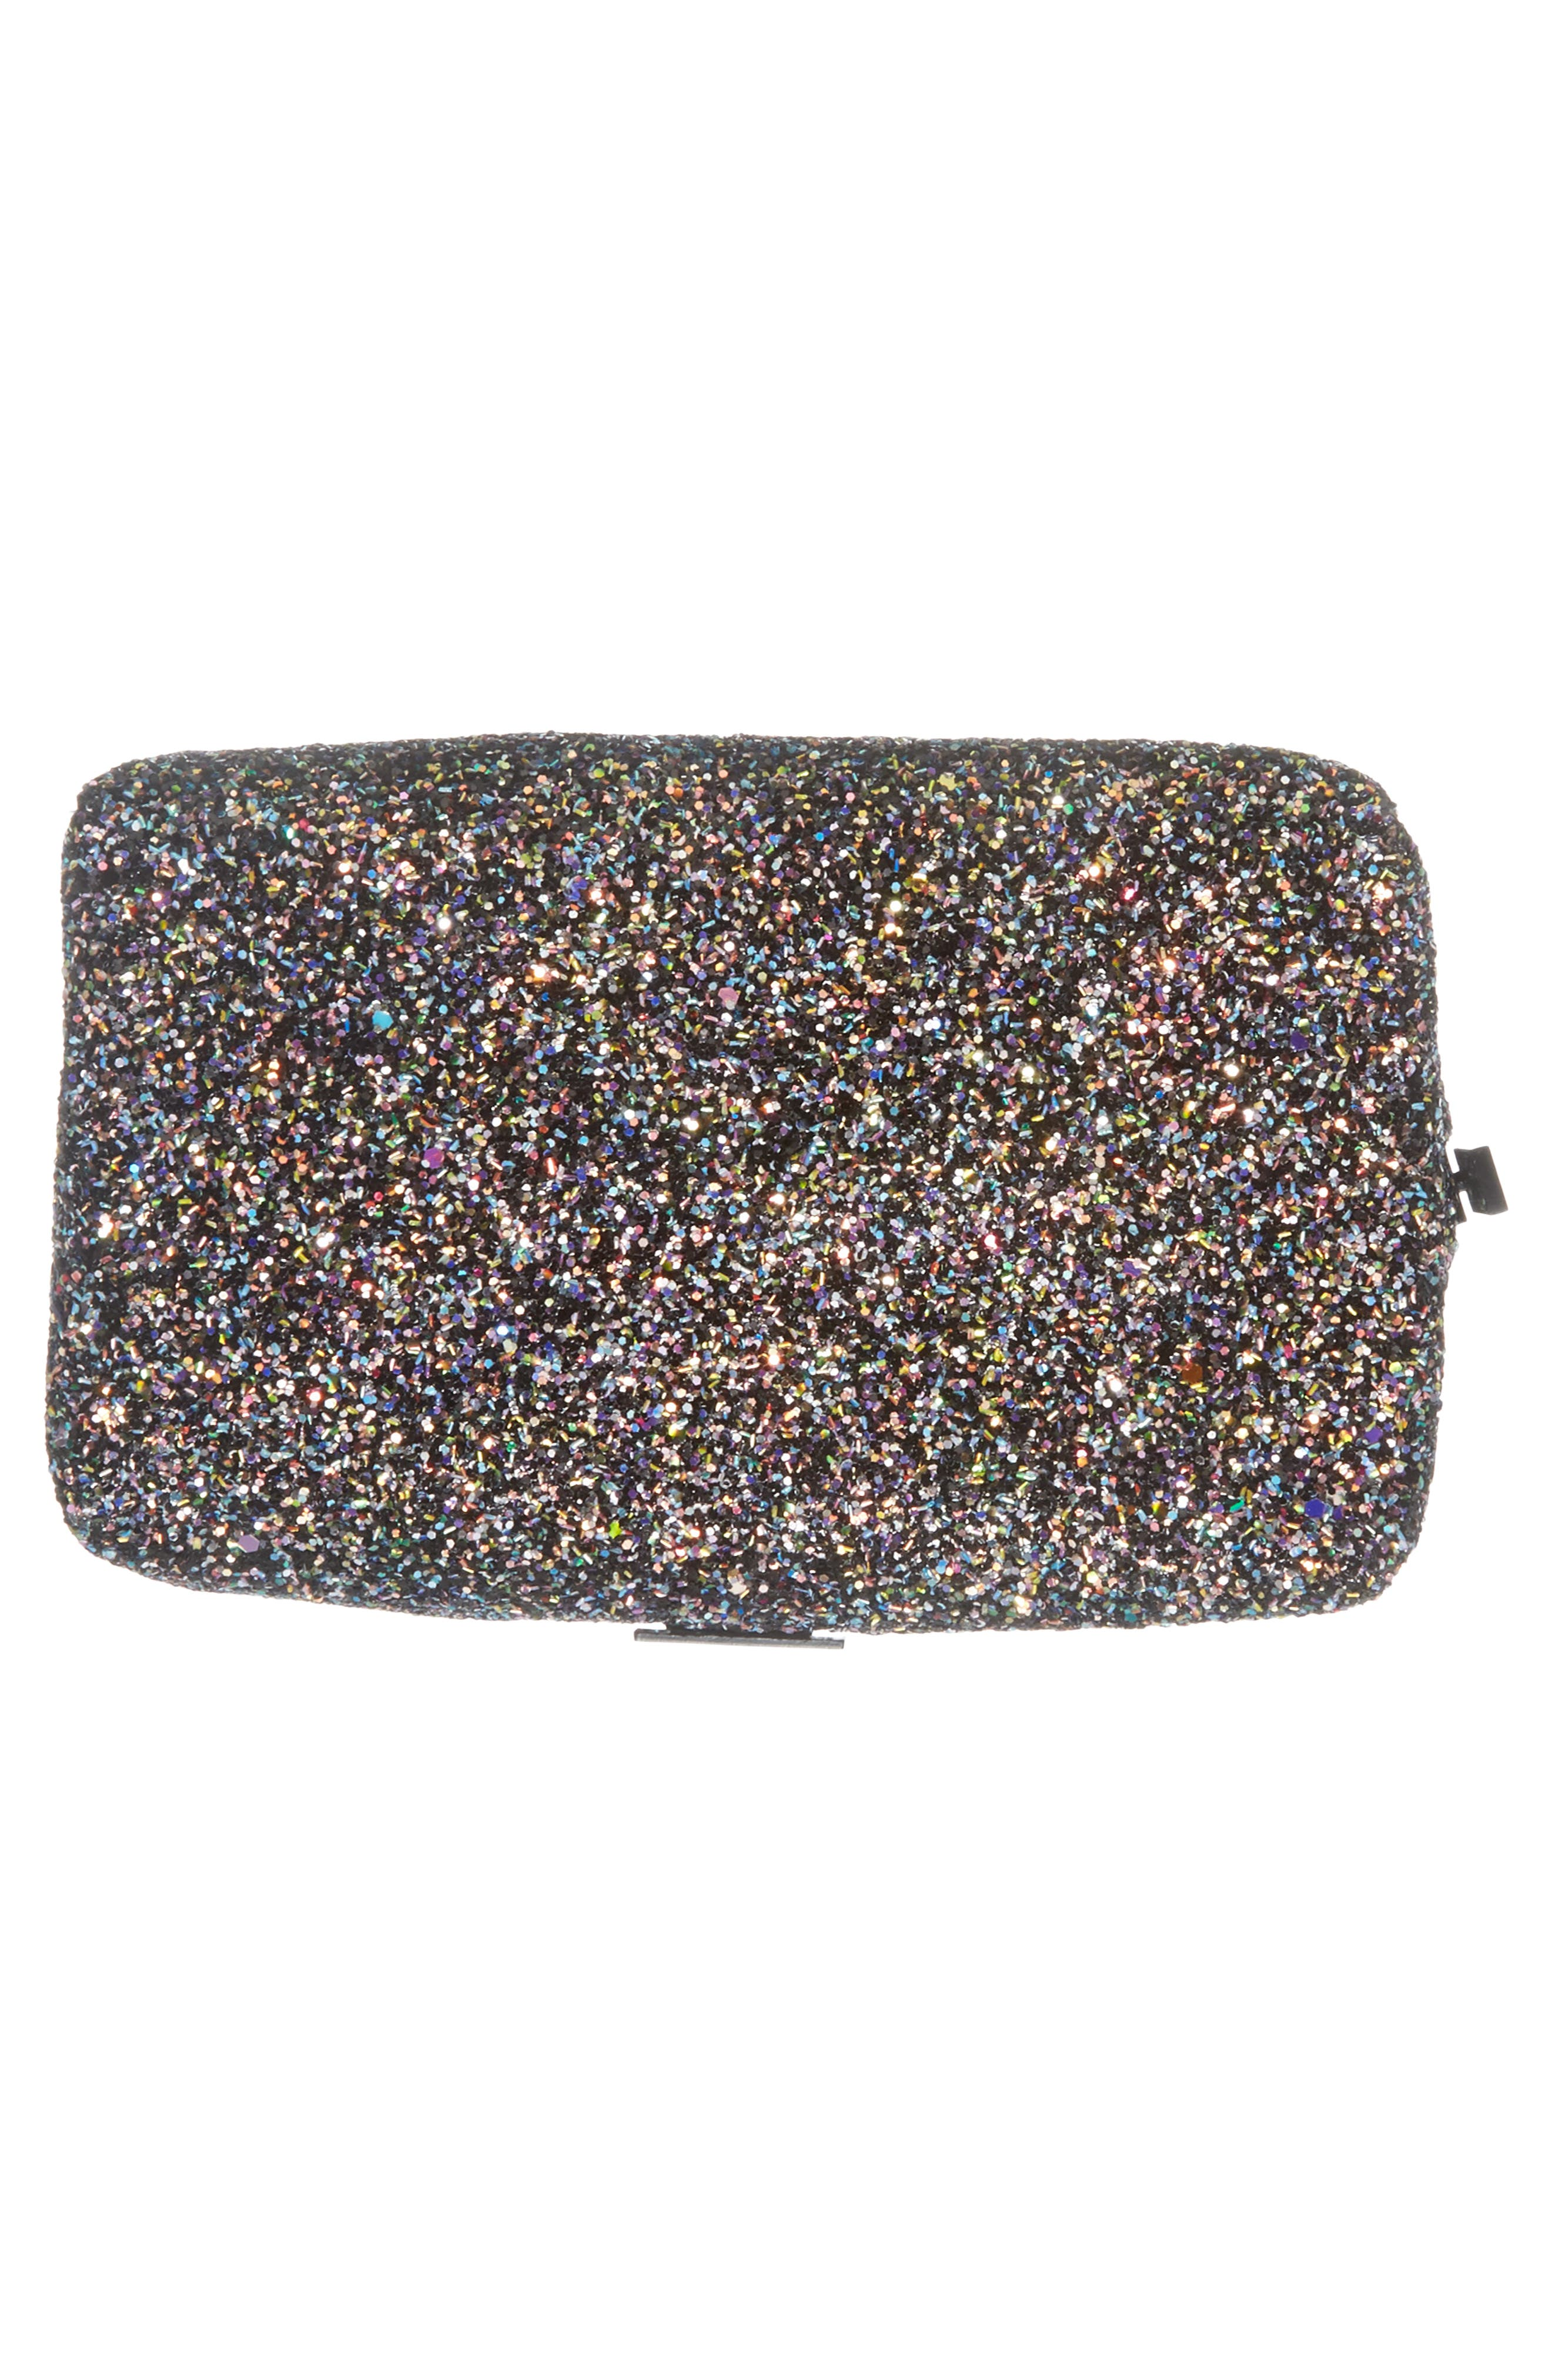 Skinny Dip Liquorice Glitter Cosmetics Bag,                             Alternate thumbnail 5, color,                             000